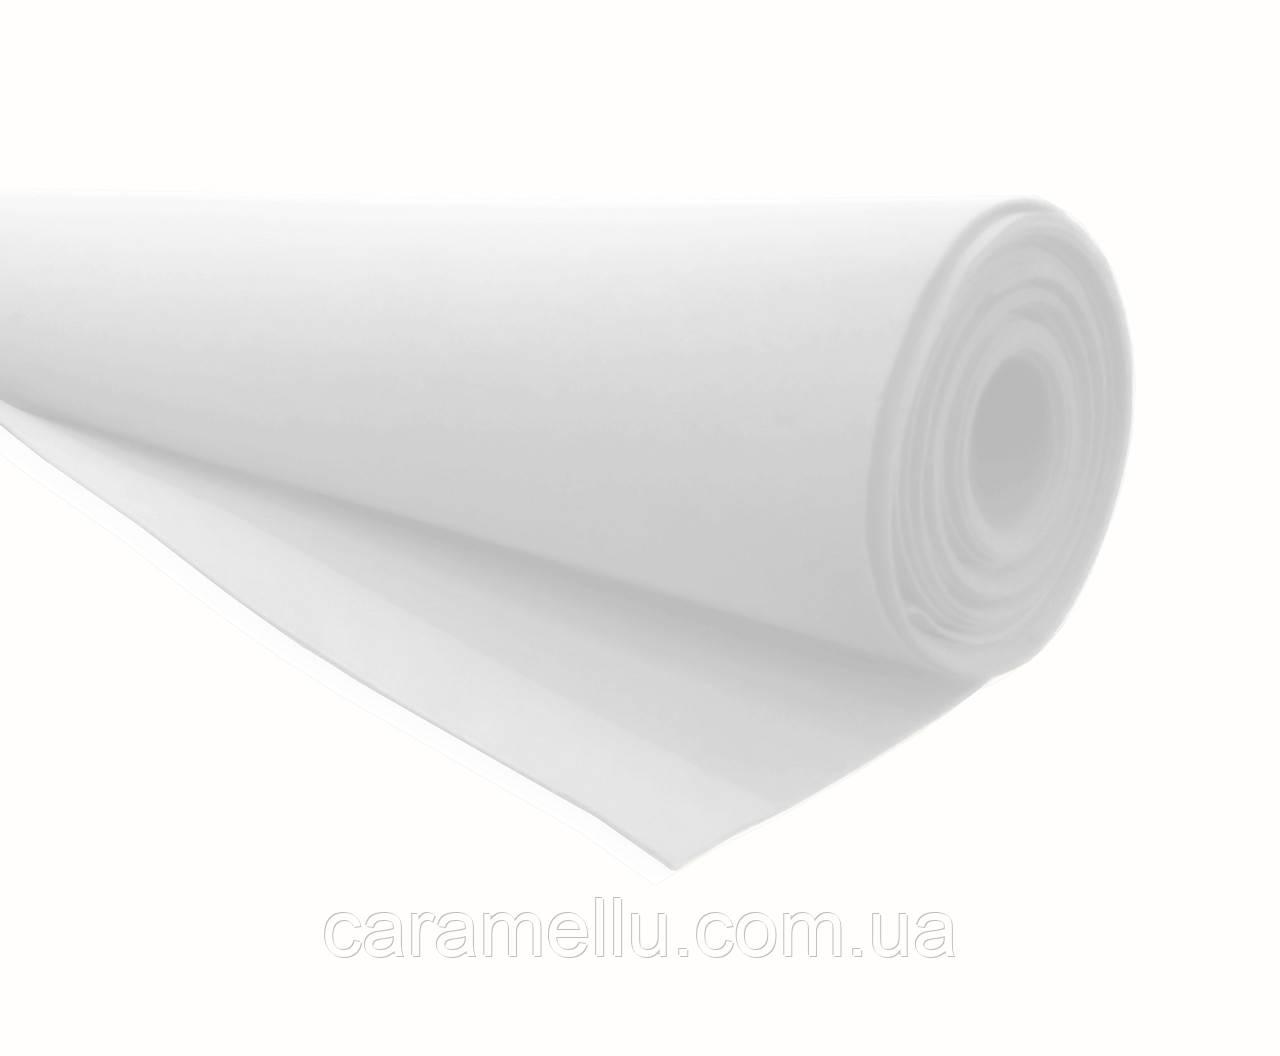 Фоамиран турецкий 2мм. Цвет Белый